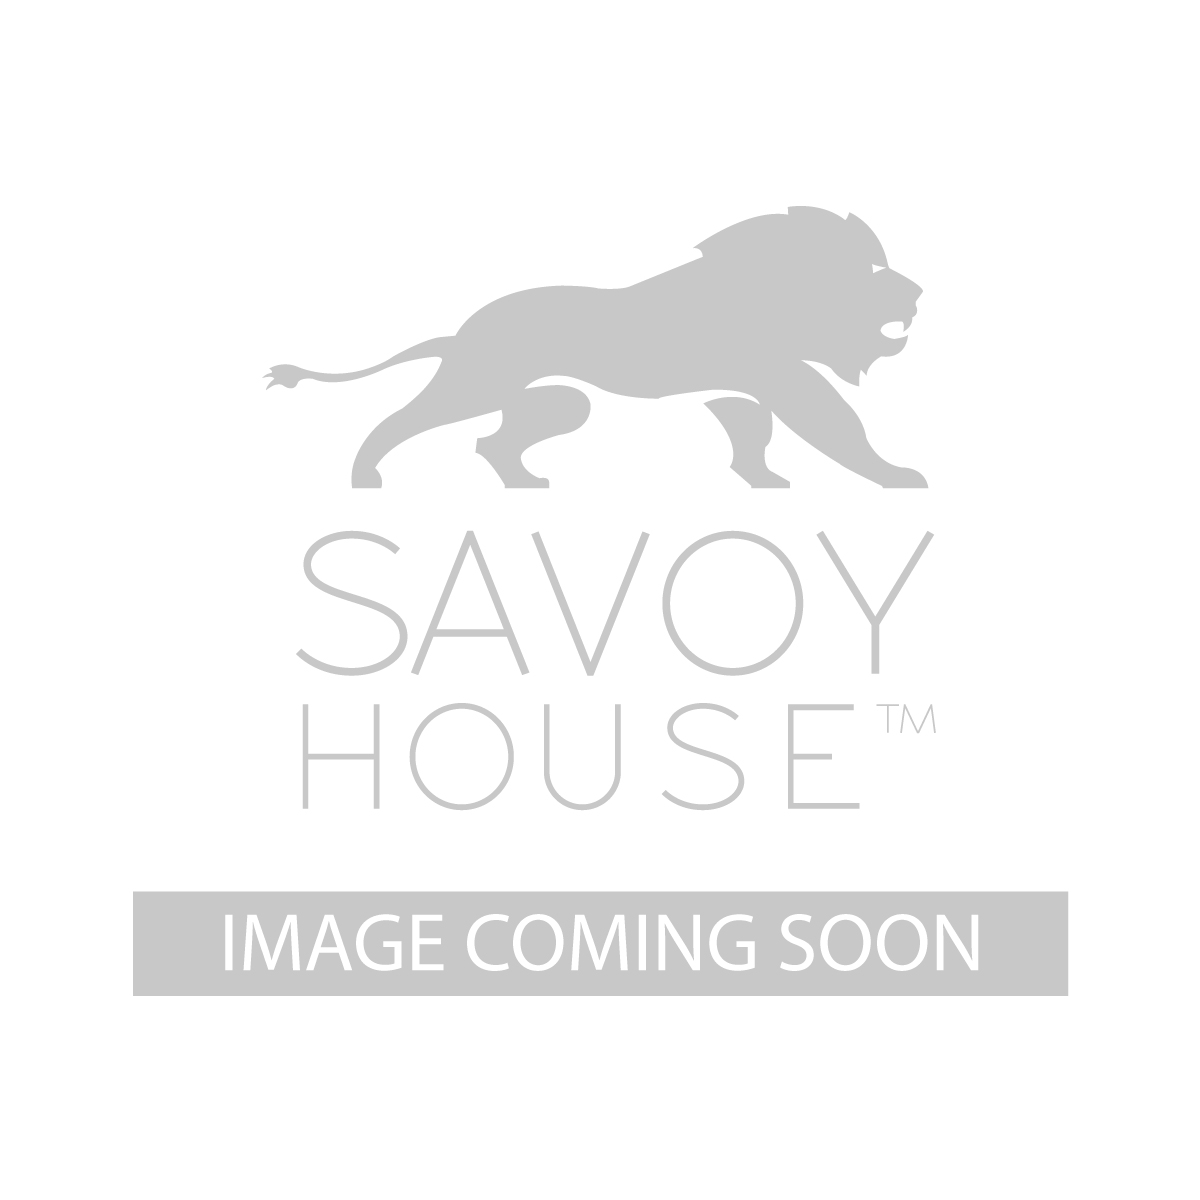 7 8091 3 13 Bassett 3 Light Outdoor Pendant By Savoy House